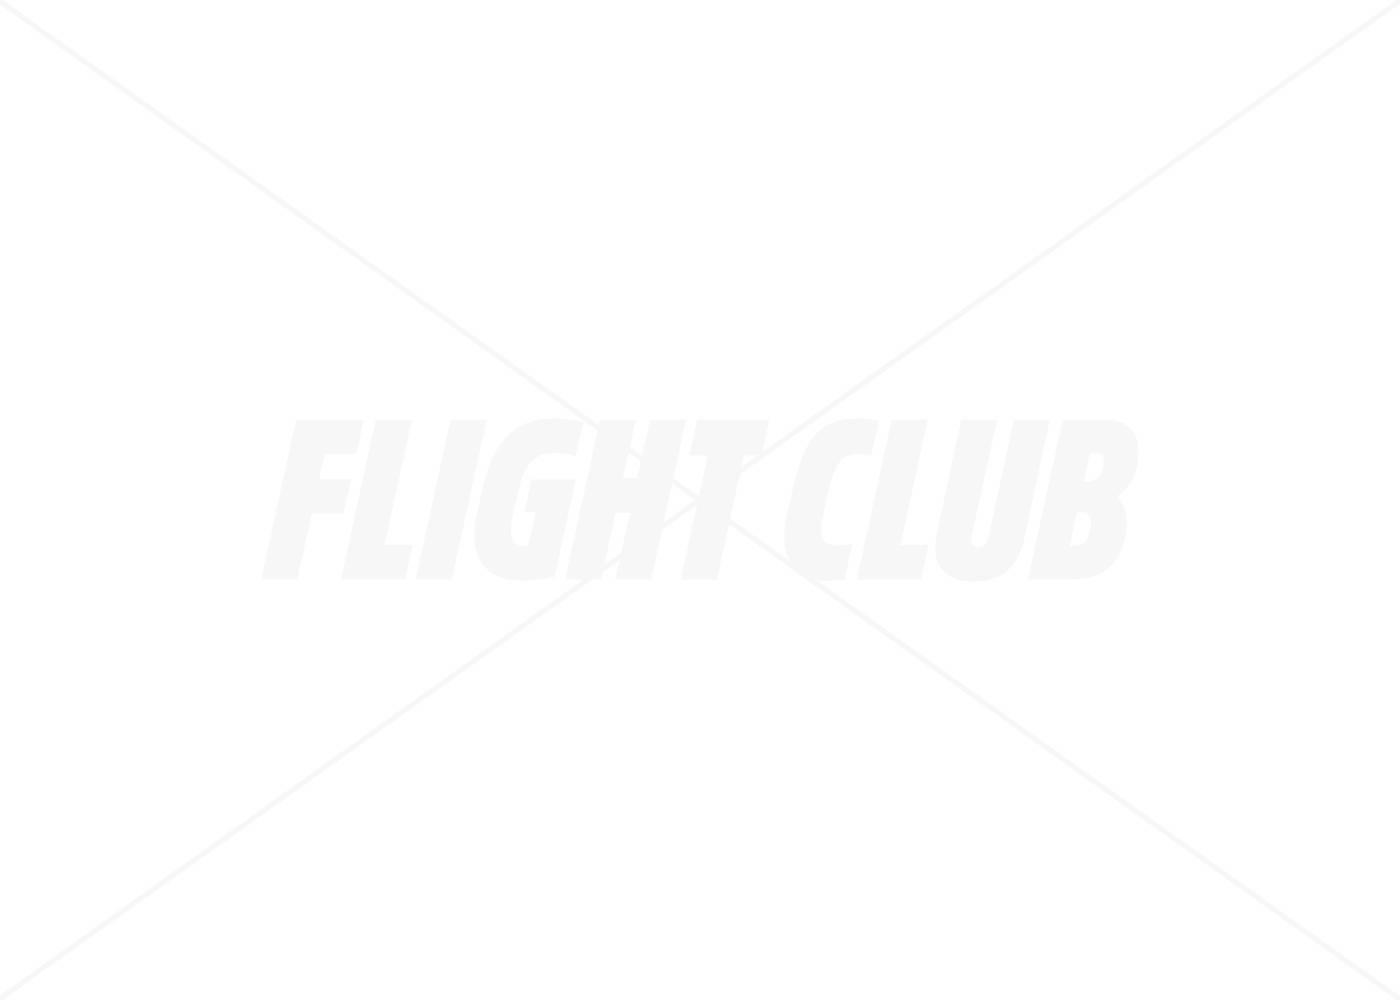 d6333c78c7014 nmd xr1 tr titolo white celestial light show